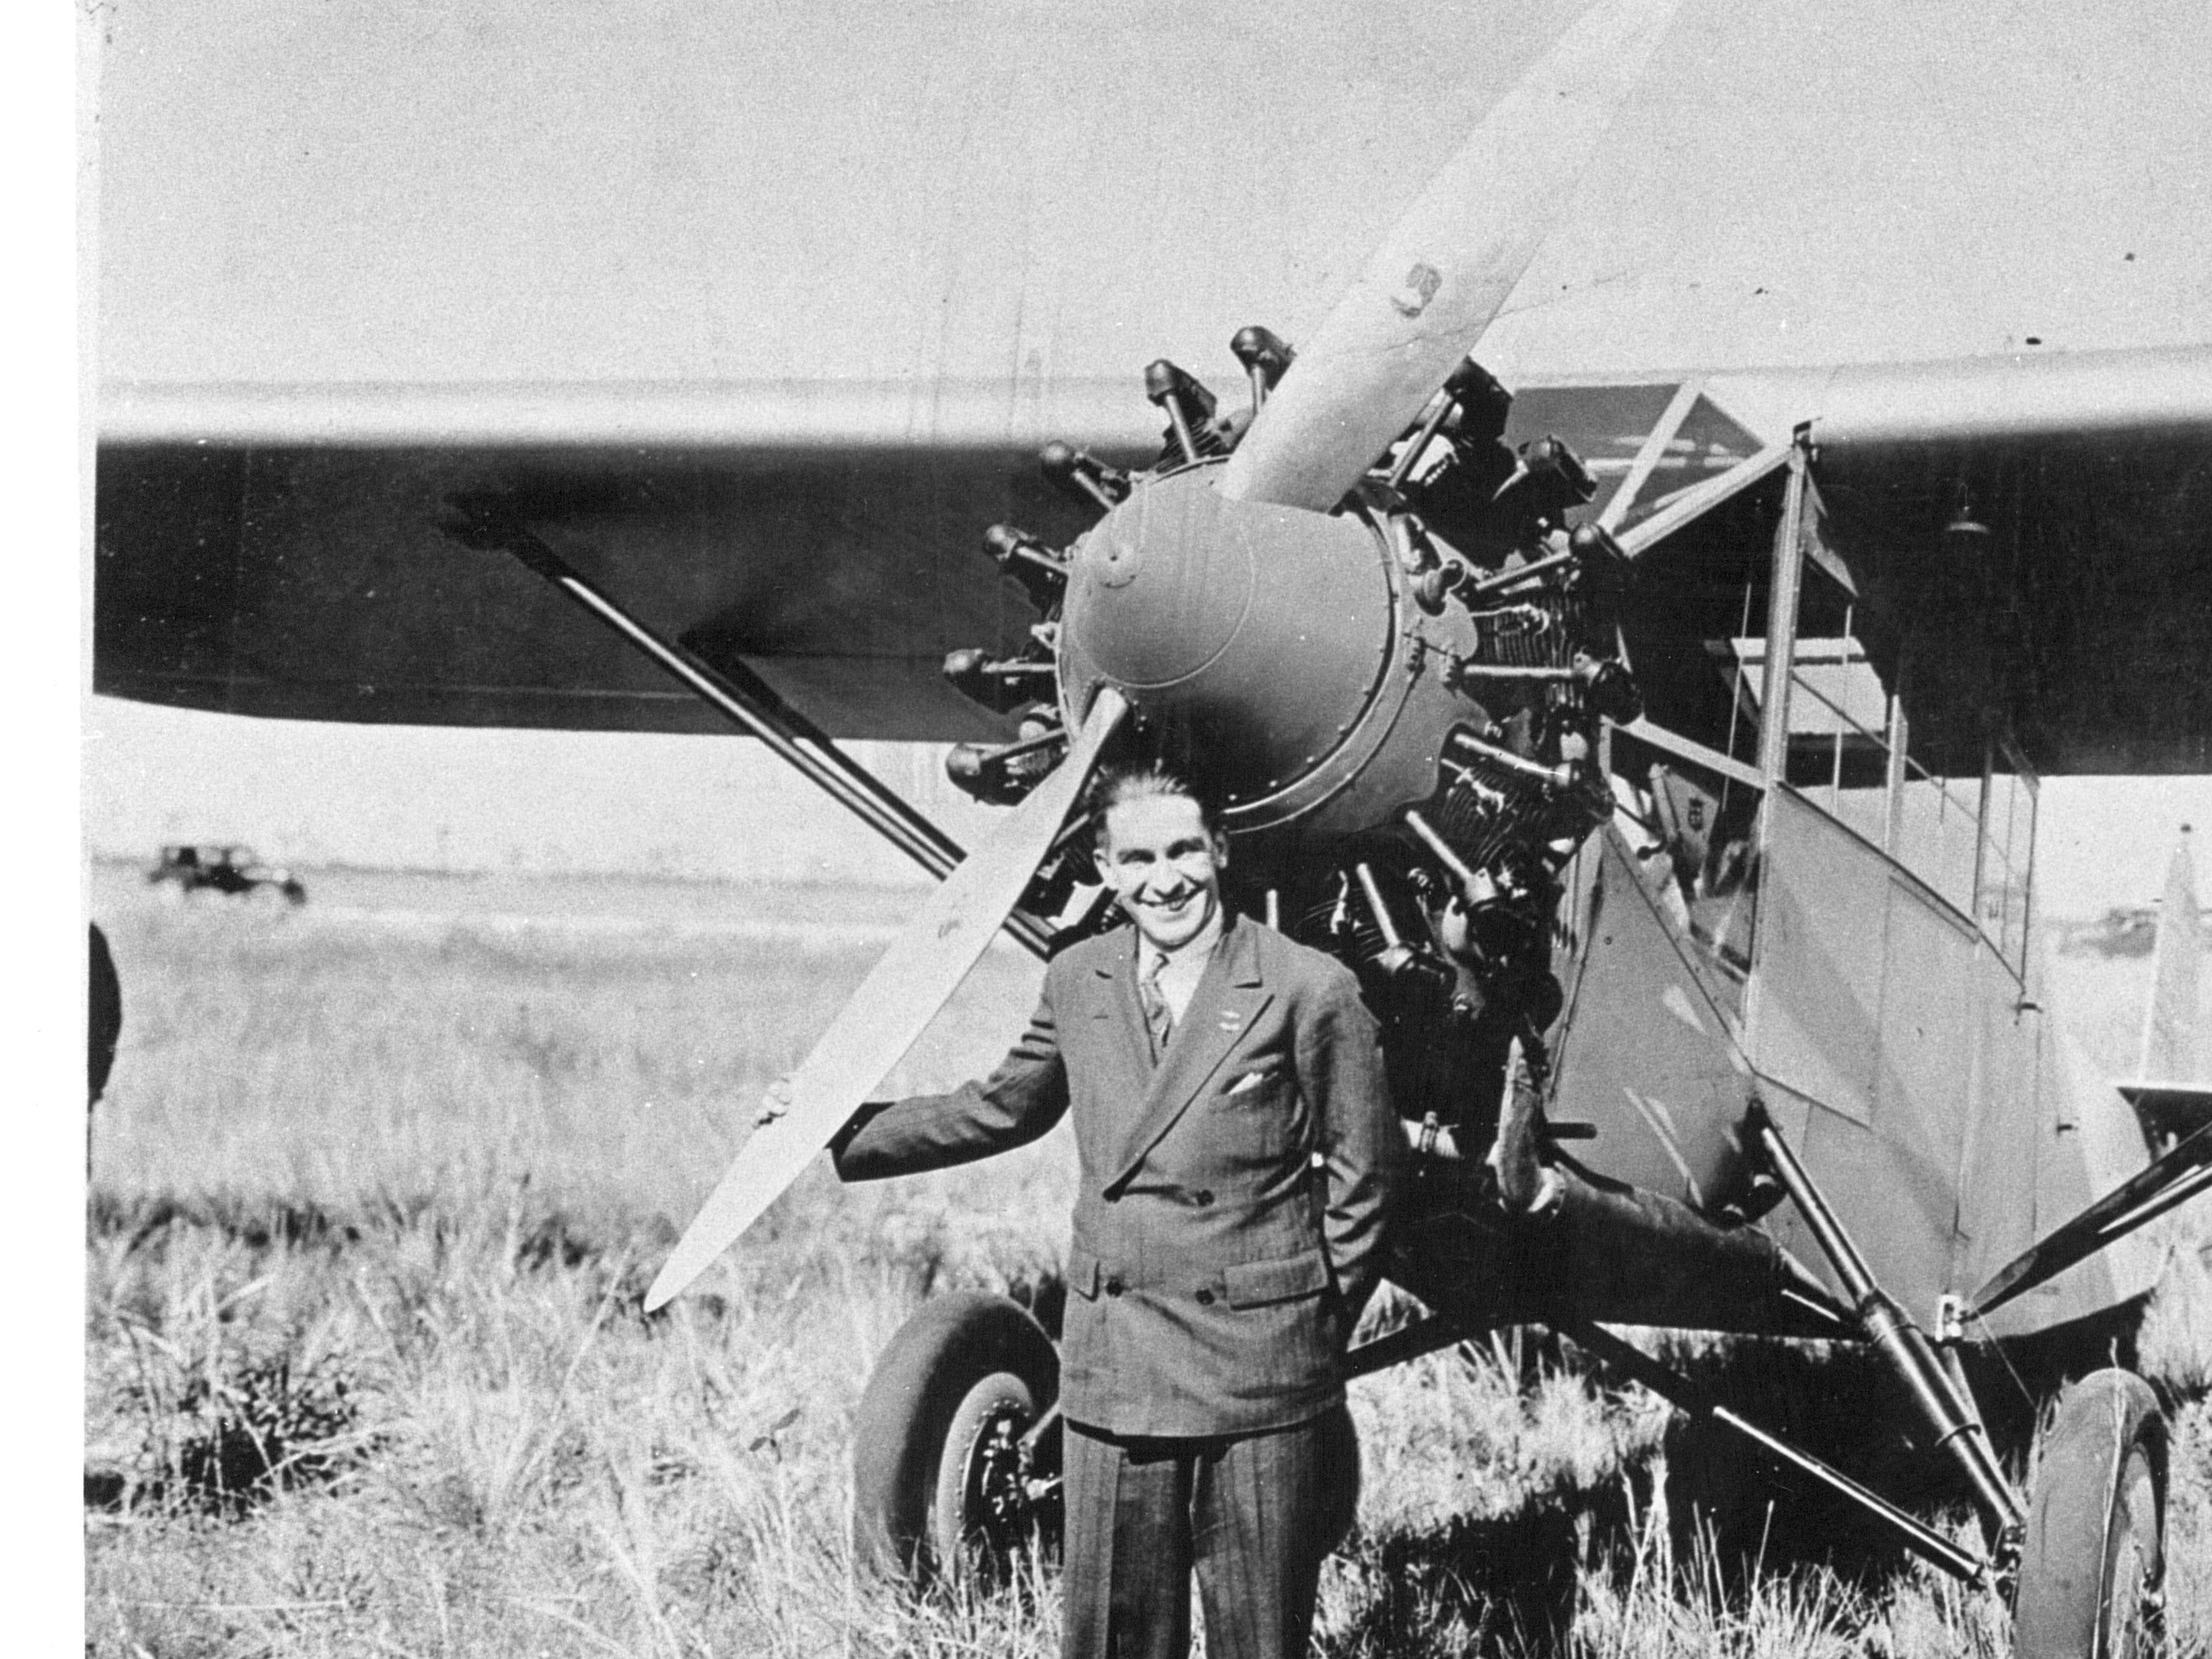 0369 aviator captain george w. haldeman zkjhta